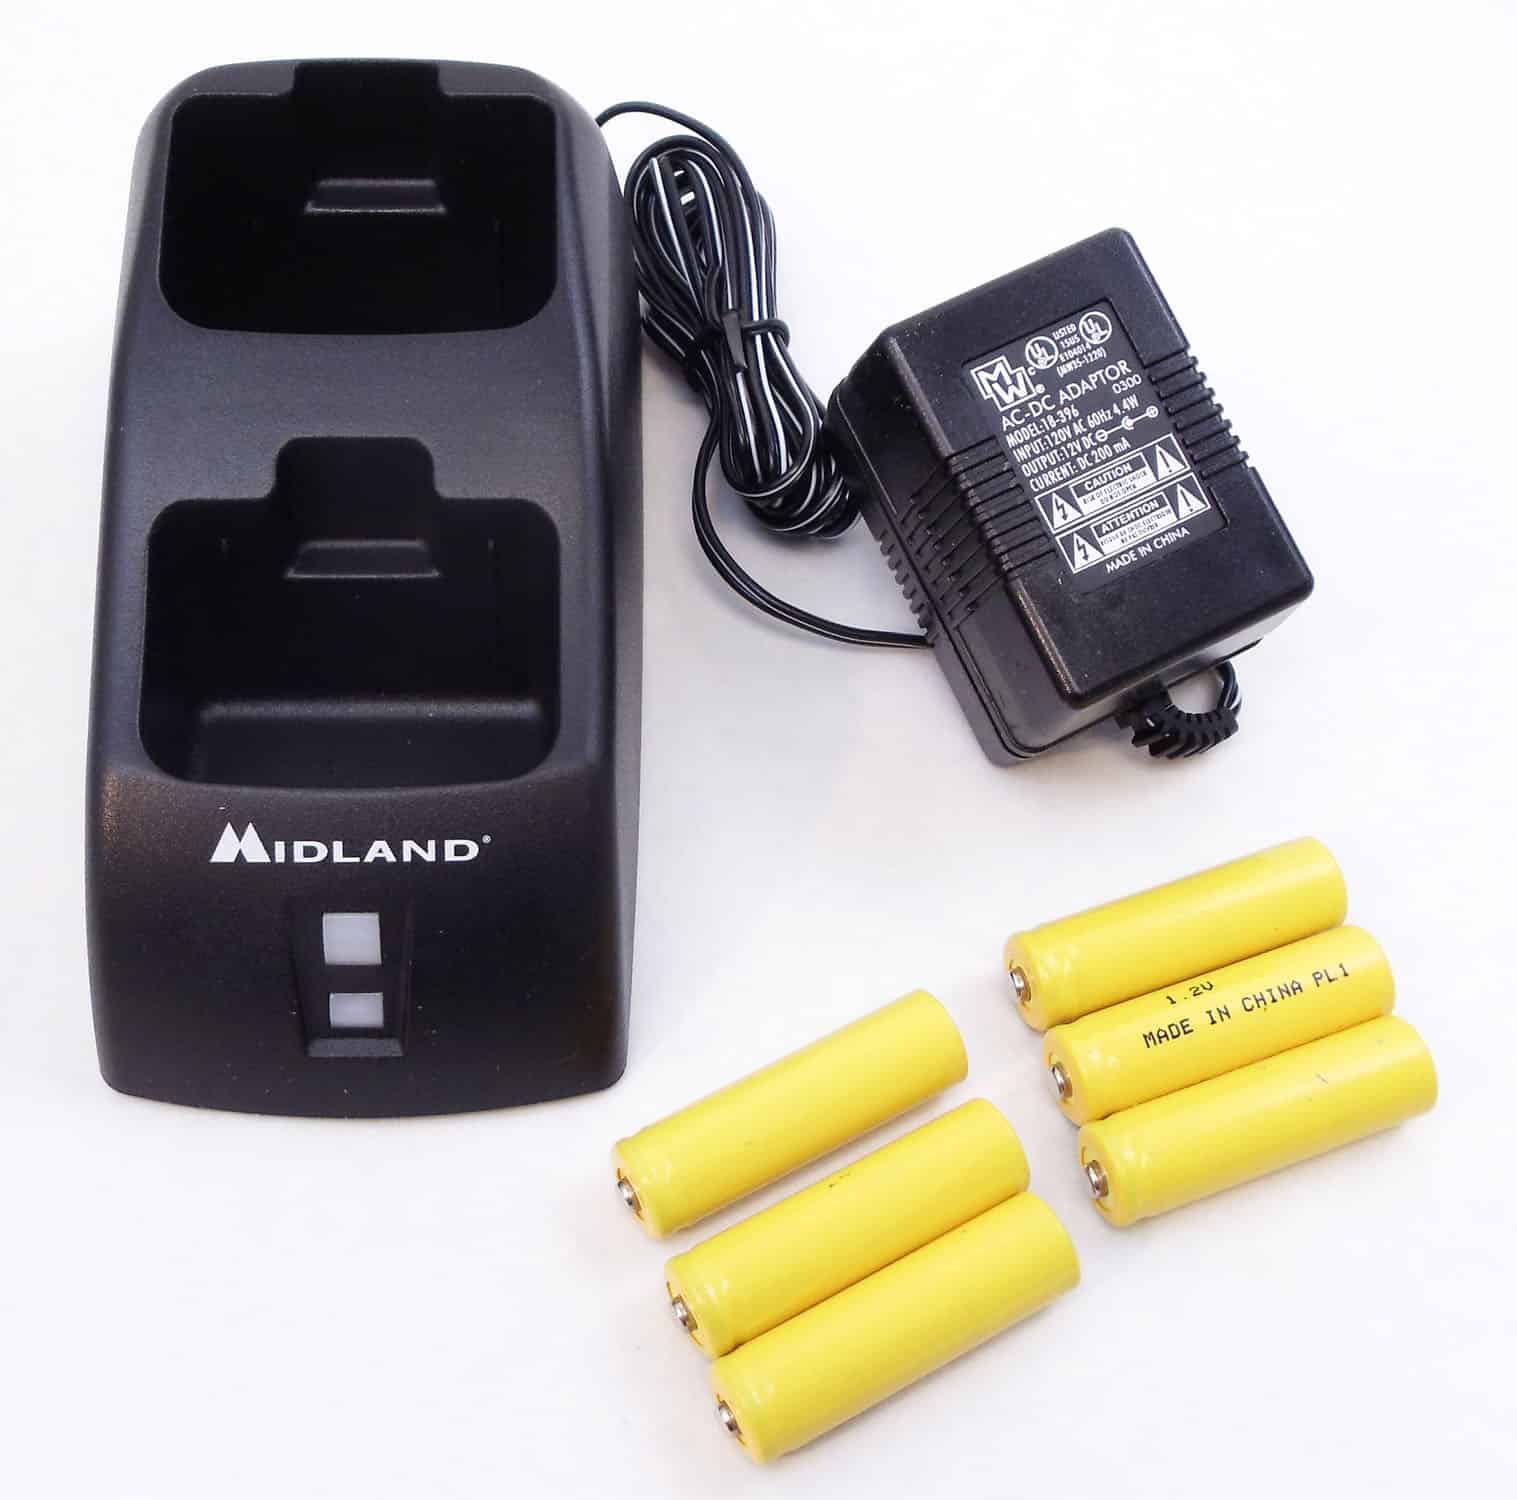 18385BT - Midland Dual Charging Base Adapter